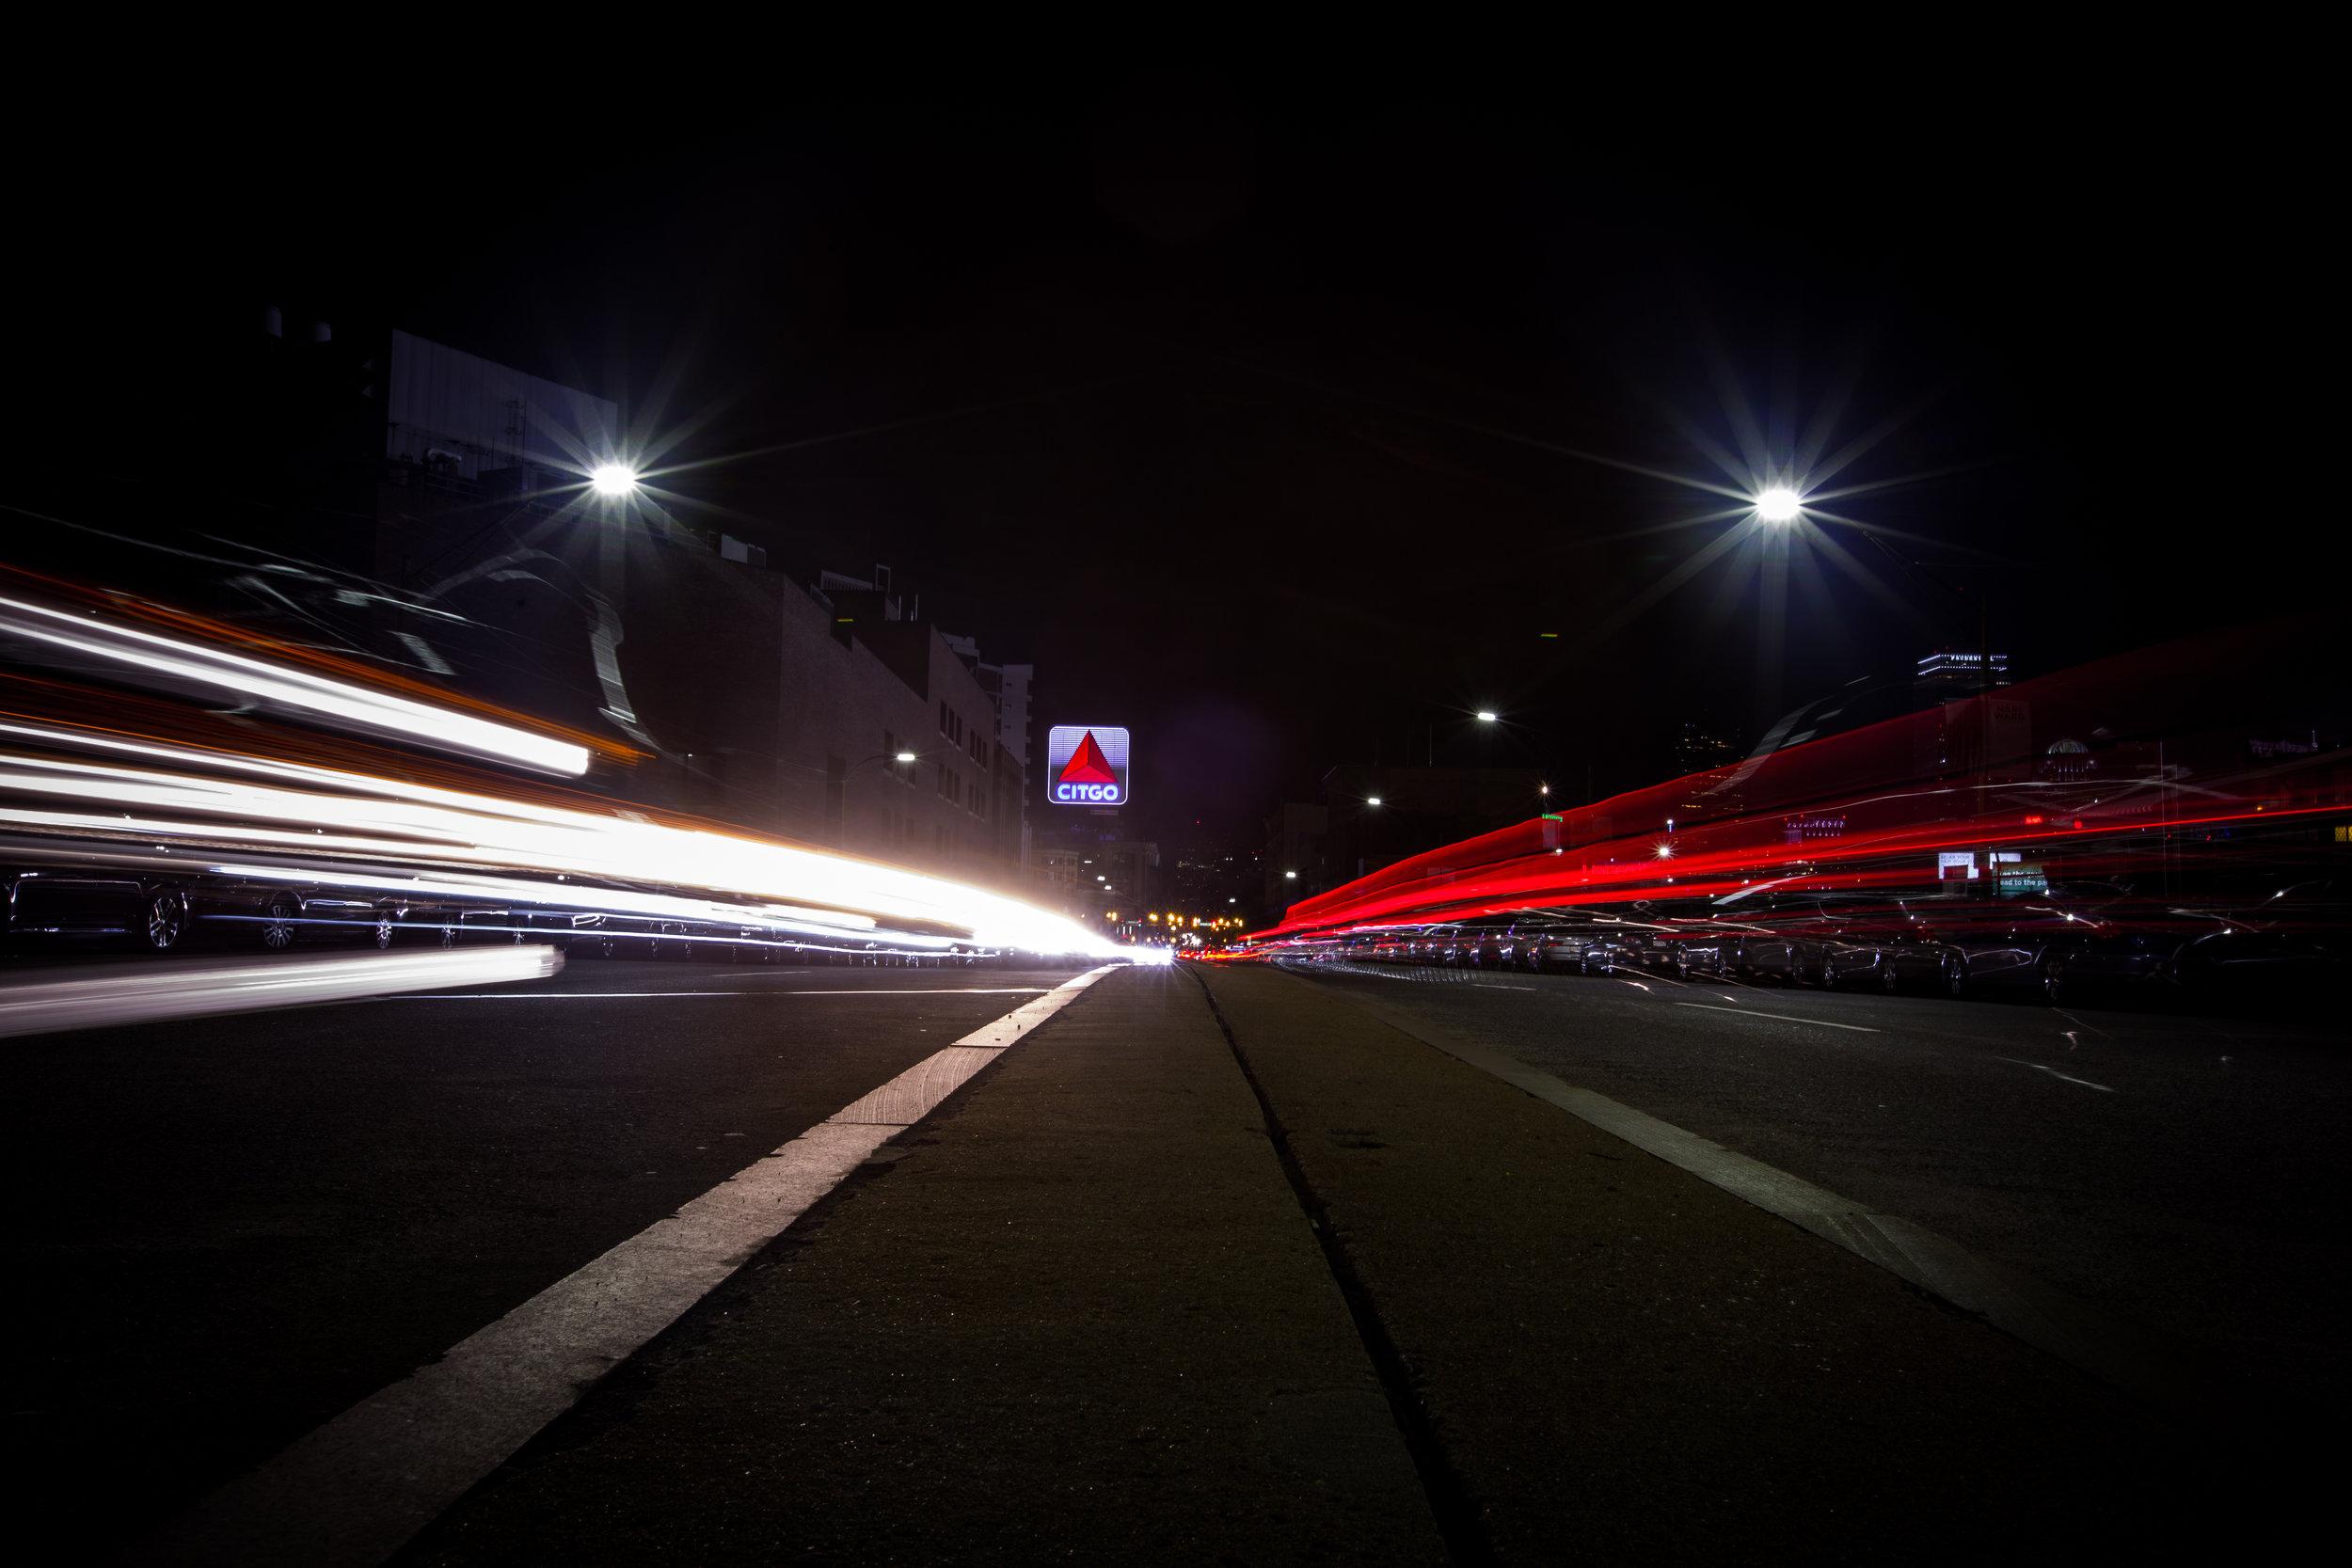 Light Streaks to the Citgo Sign